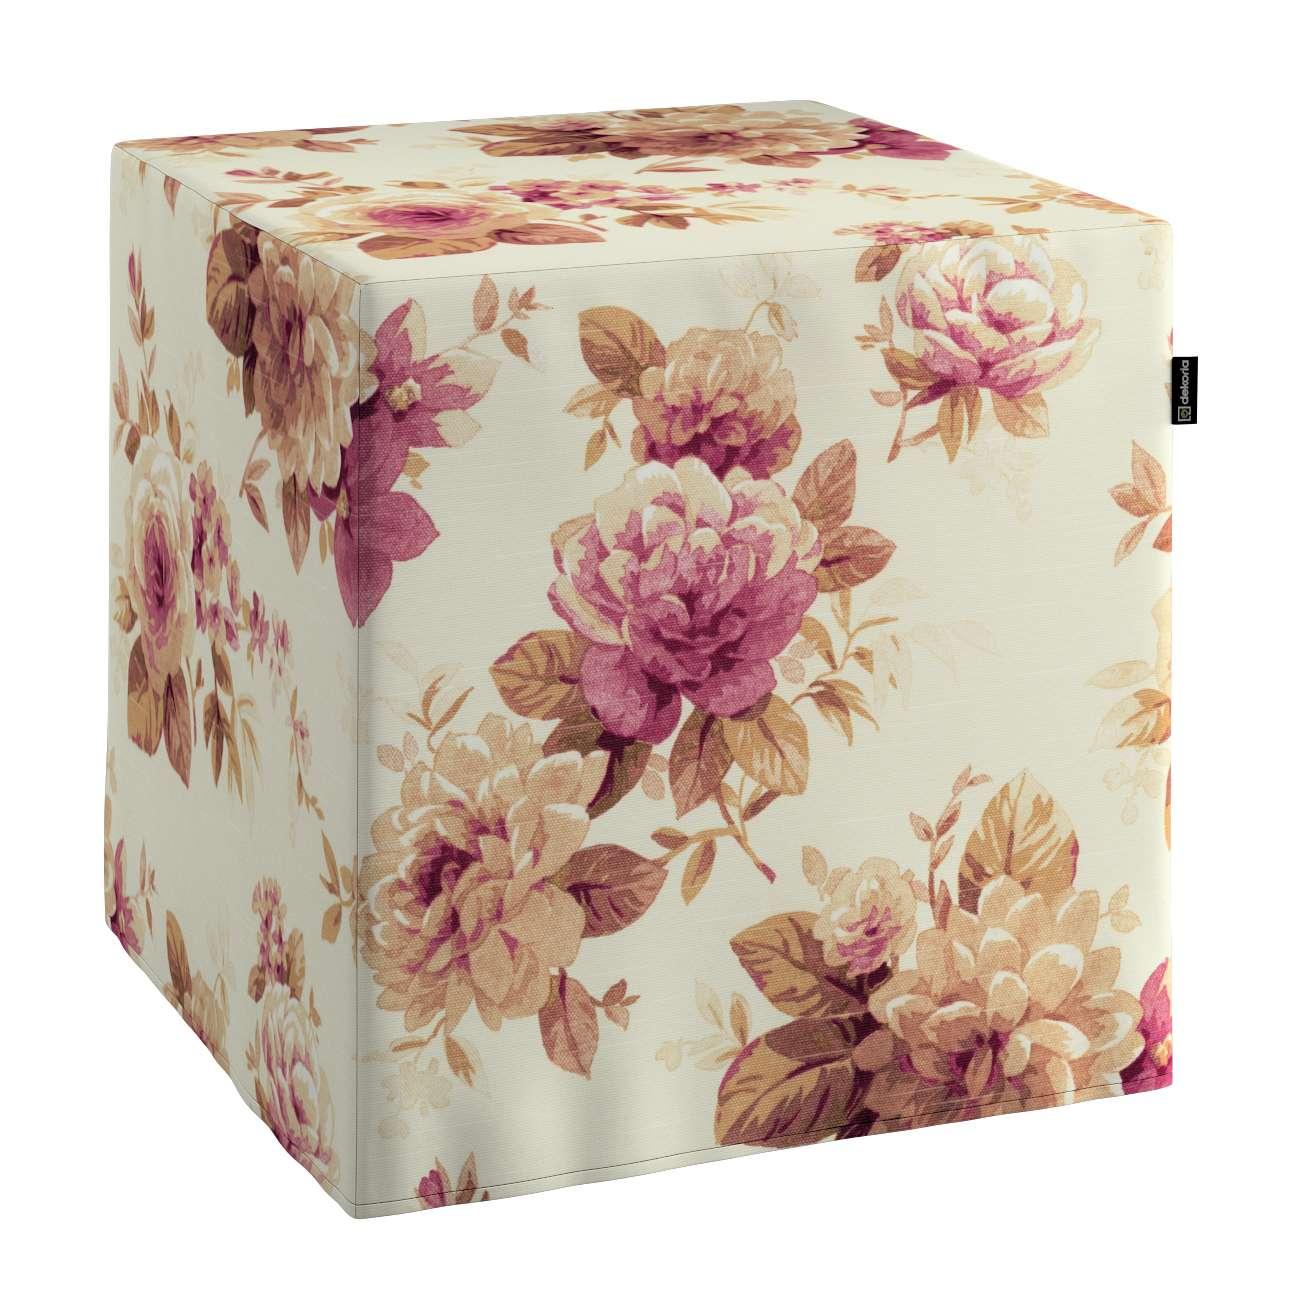 Sedák Cube - kostka pevná 40x40x40 v kolekci Mirella, látka: 141-06